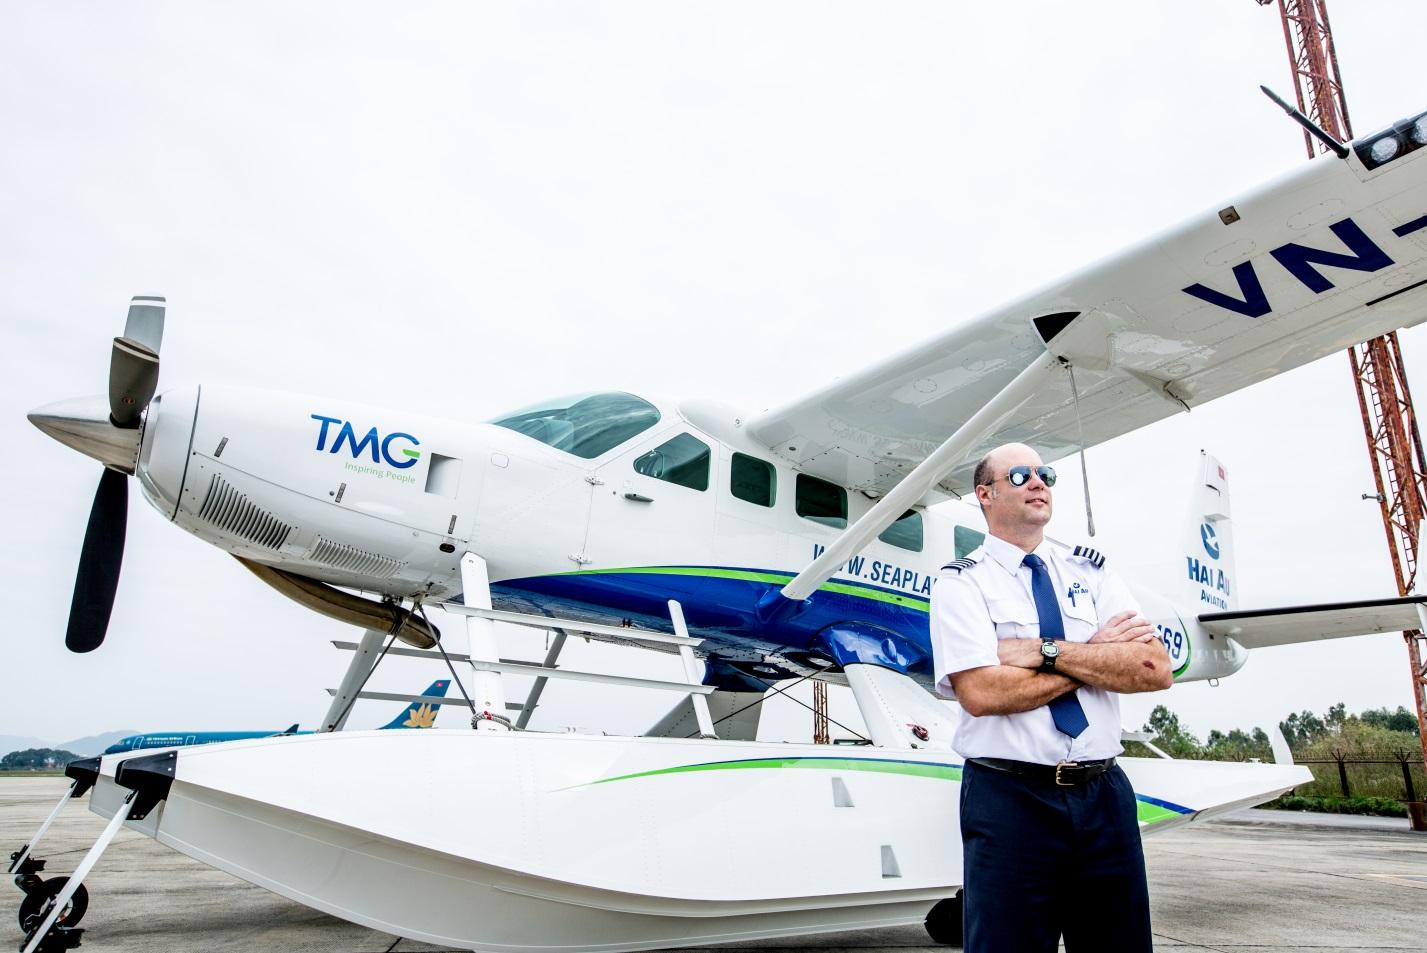 Hanoi to Halong Bay seaplane